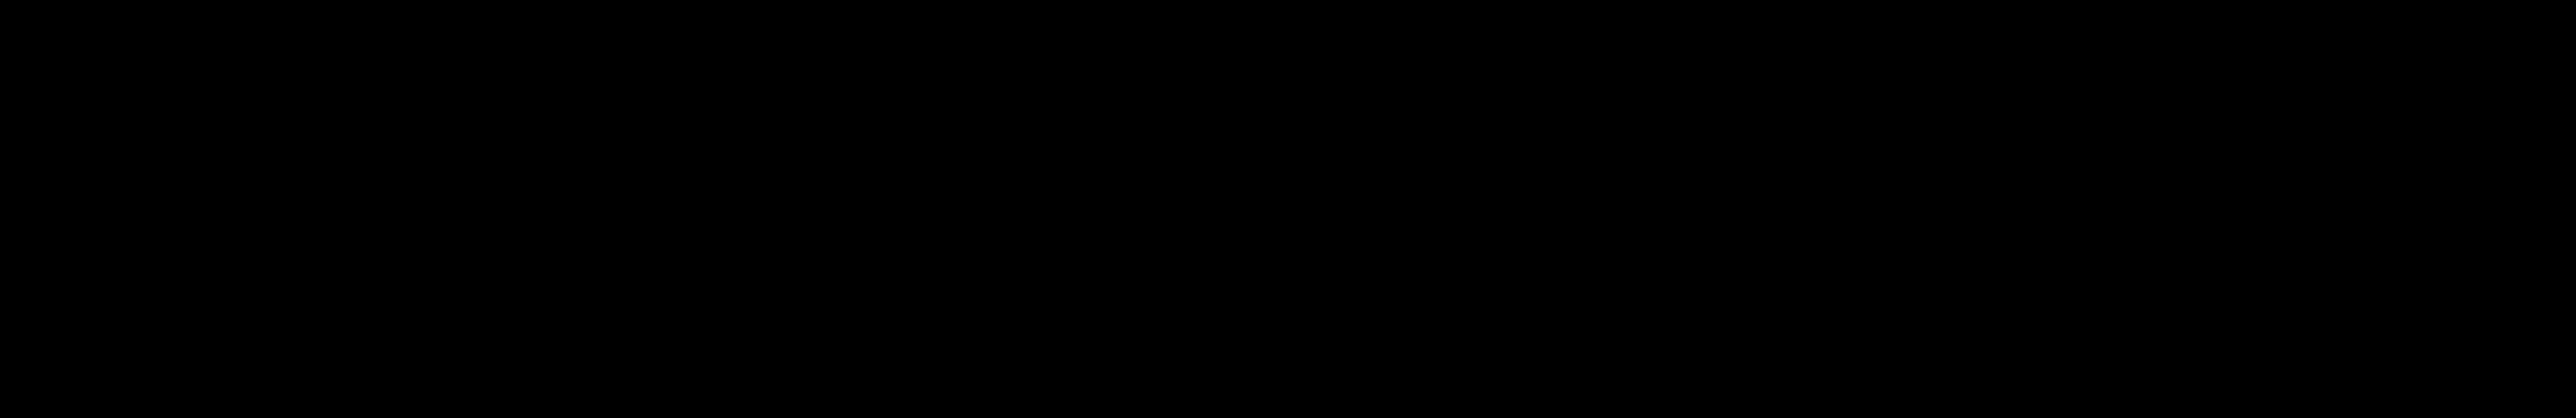 https://www.anniesophia.com/wp-content/uploads/2017/09/Herald_Sun_logo_logotype.png